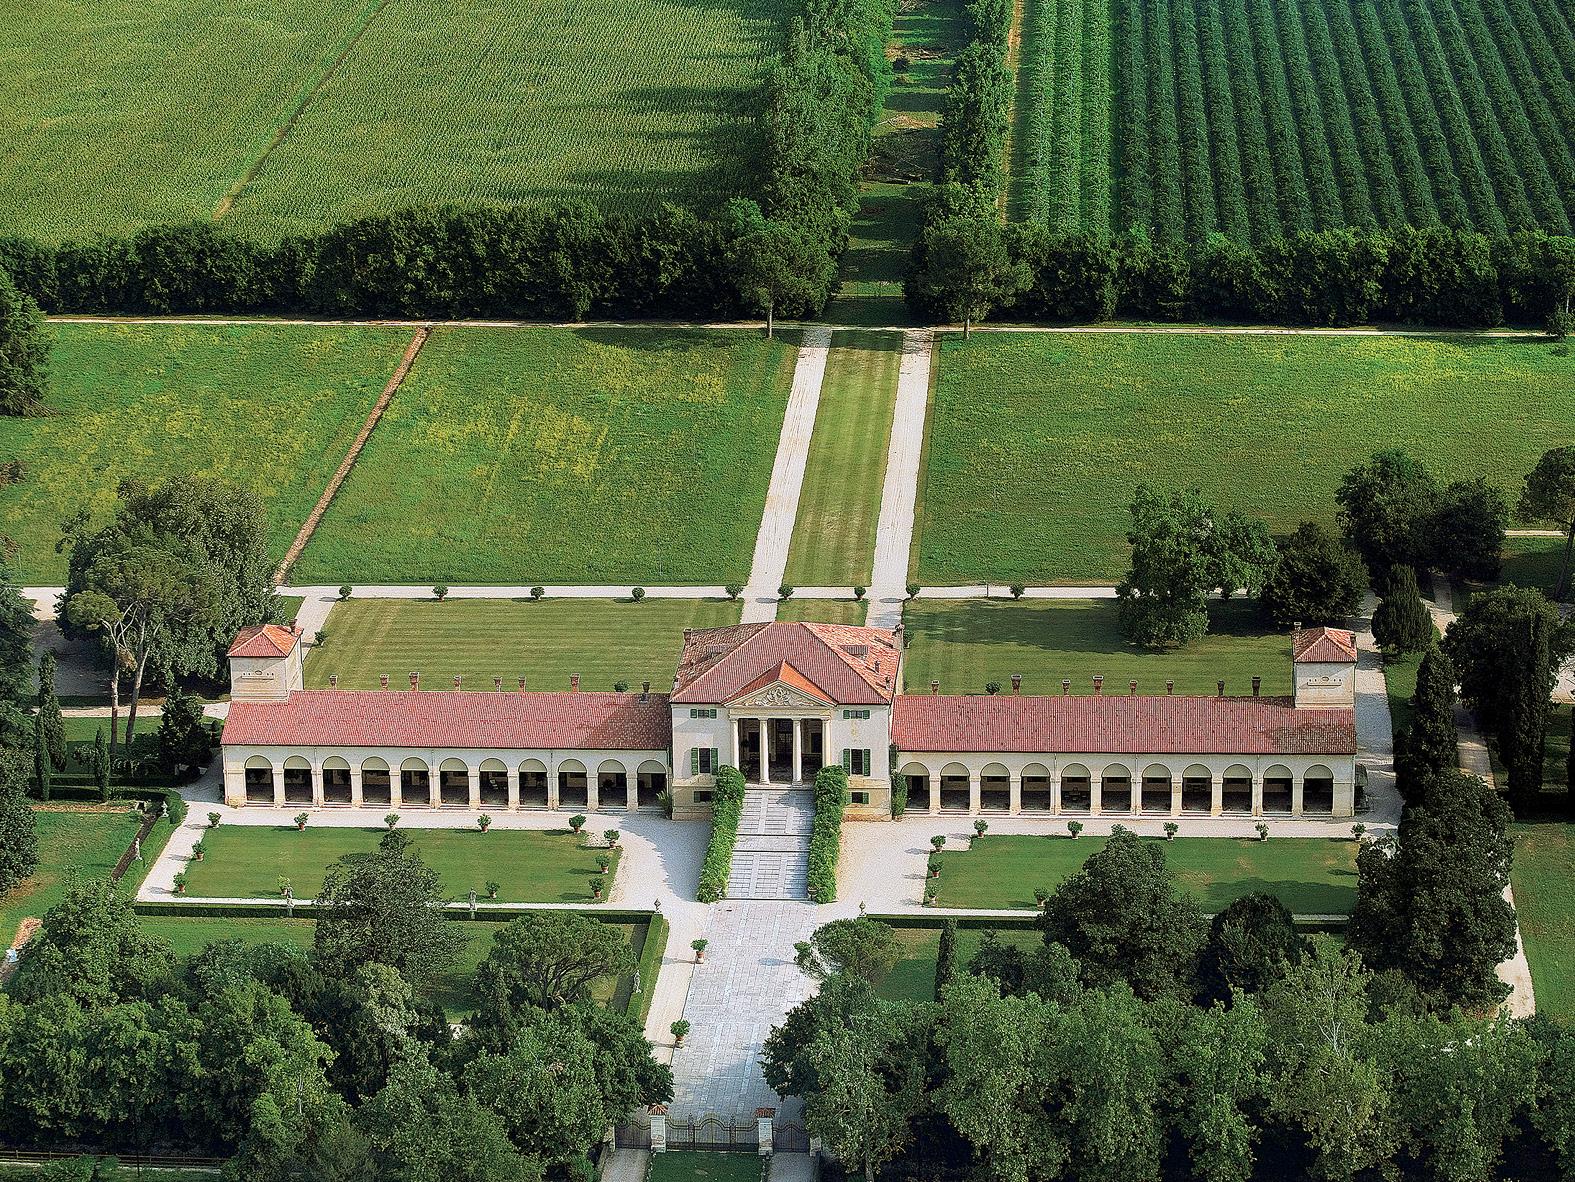 The park of Villa Emo